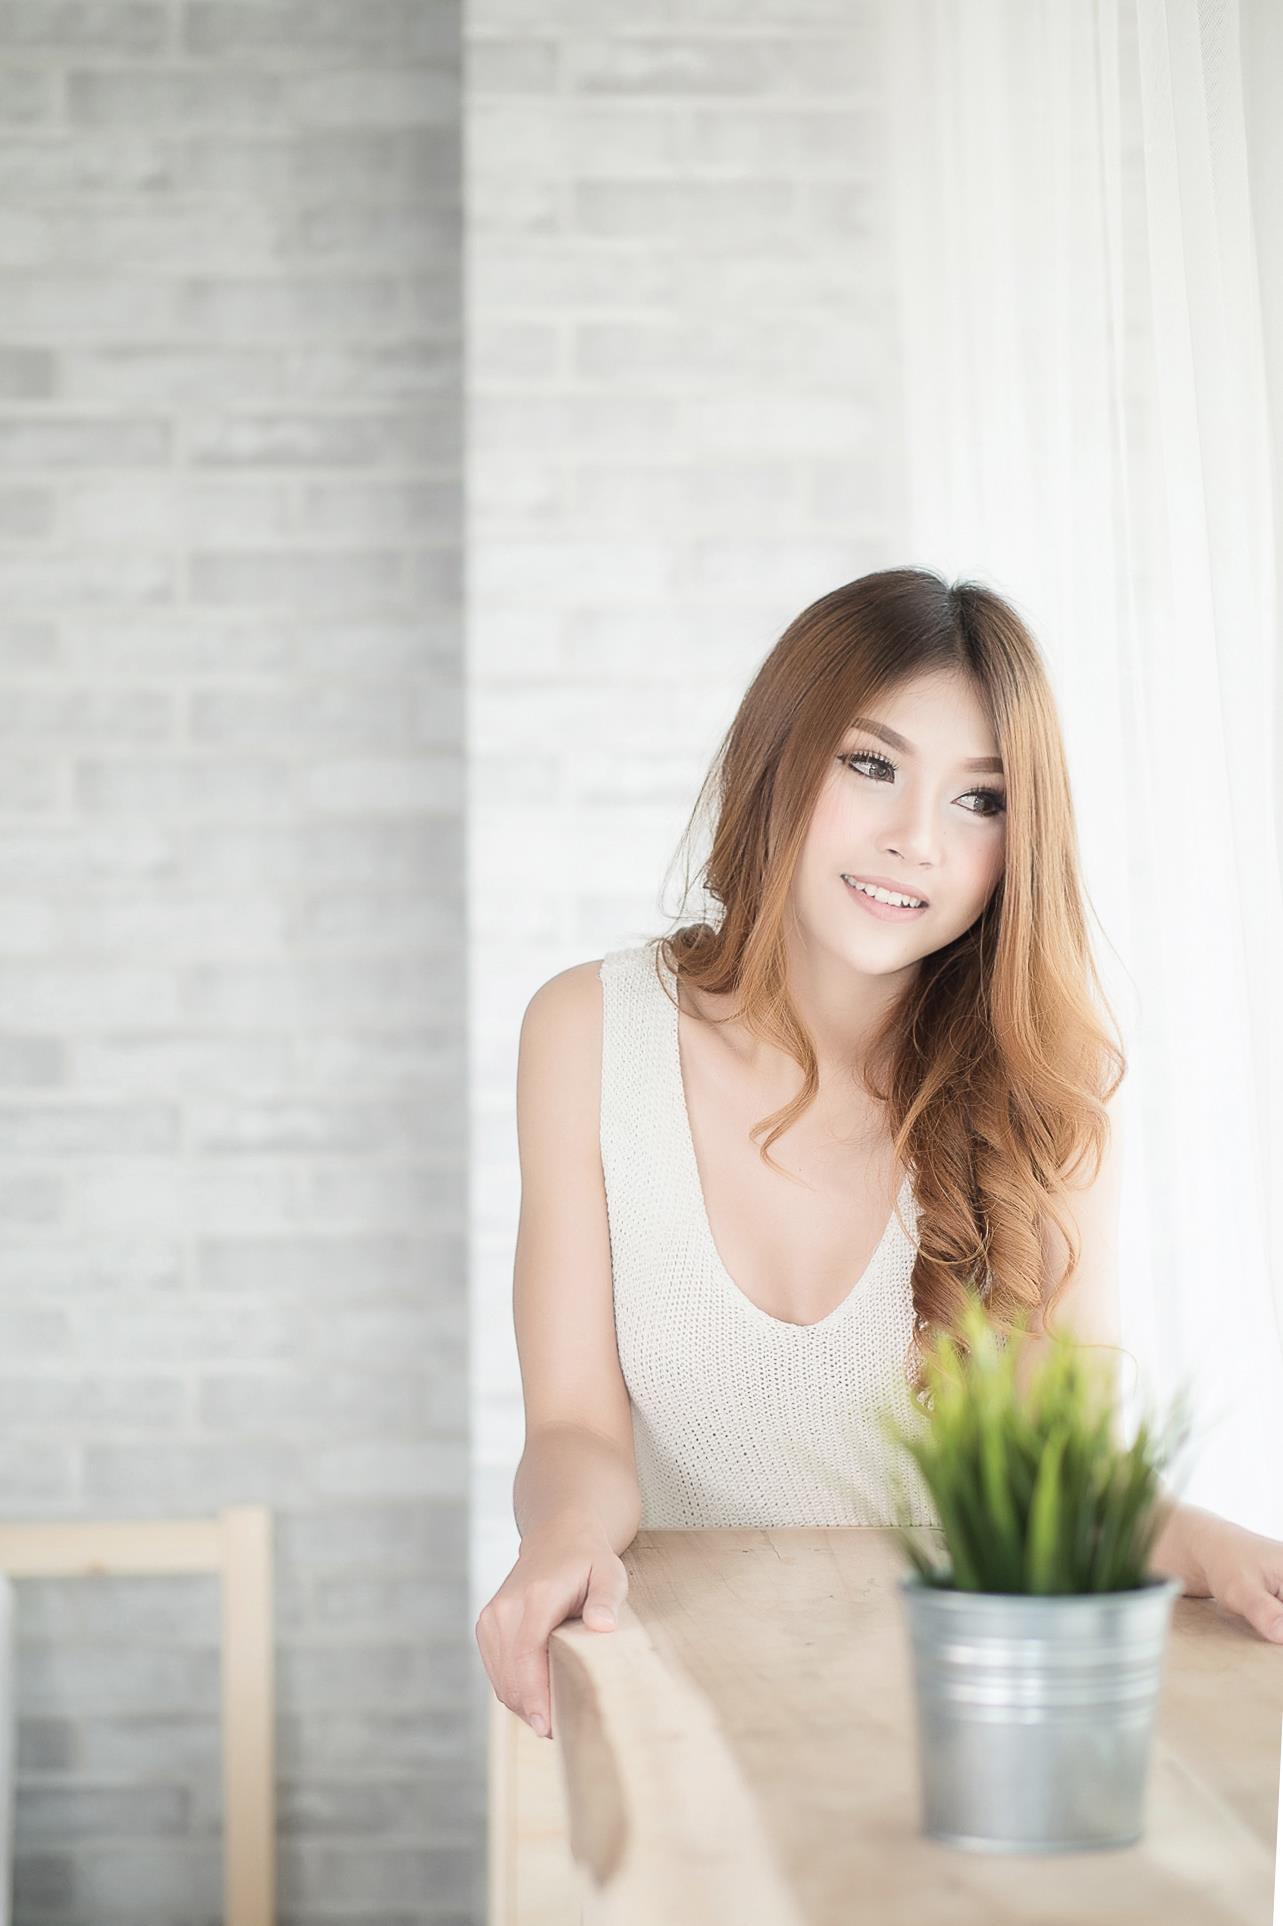 Me and Plant - Nirada Guernongkun